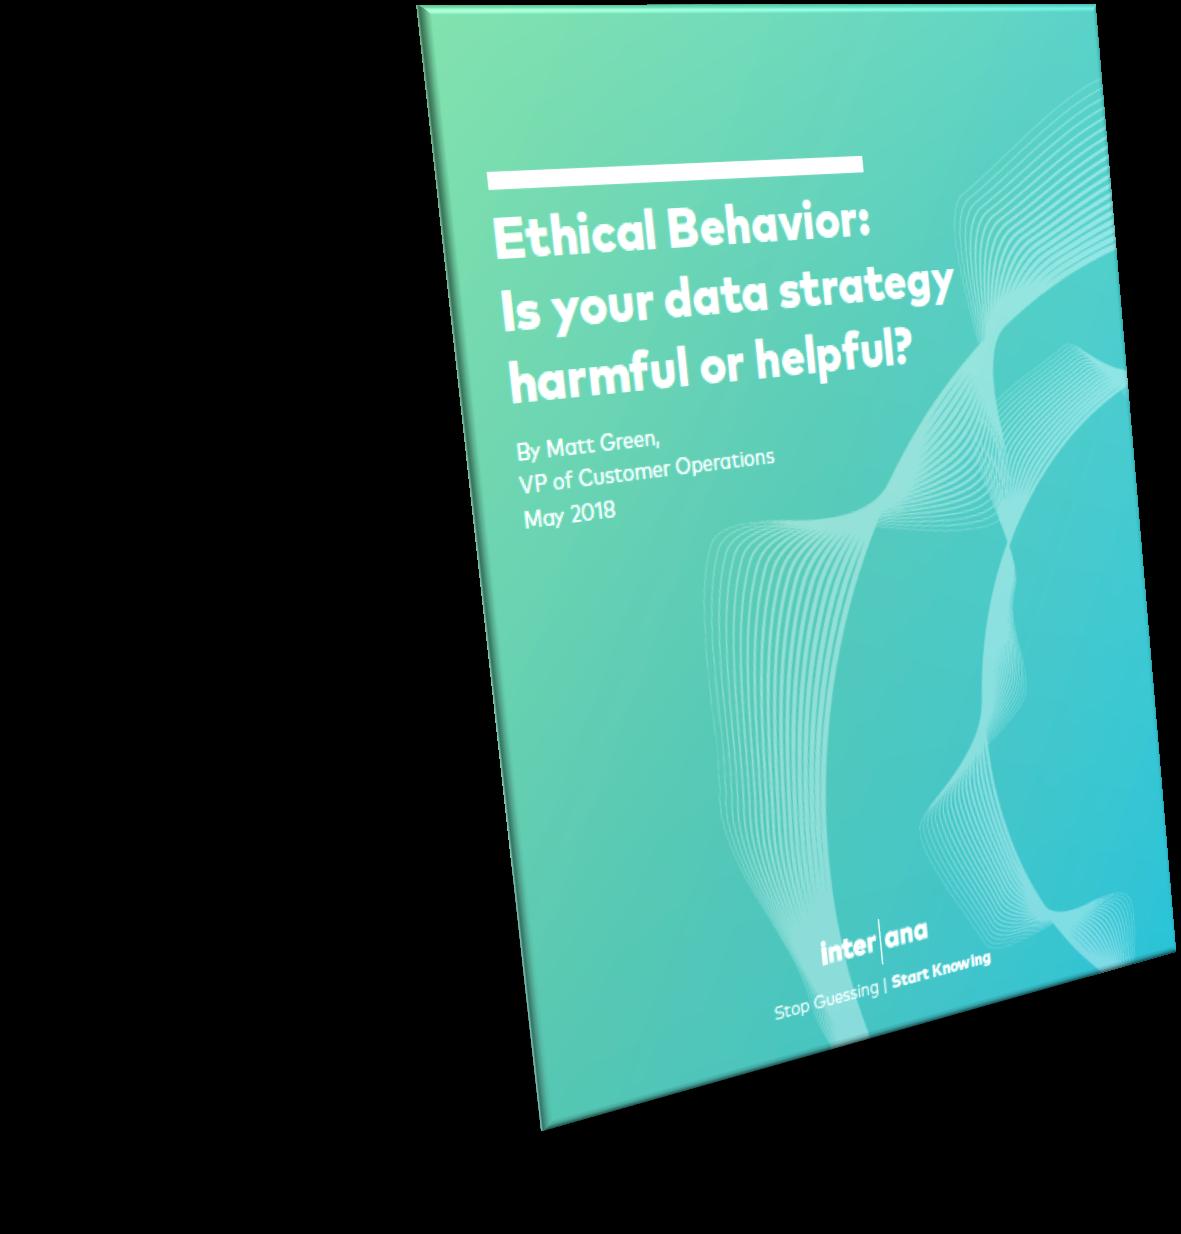 EthicalBehavior_May2018